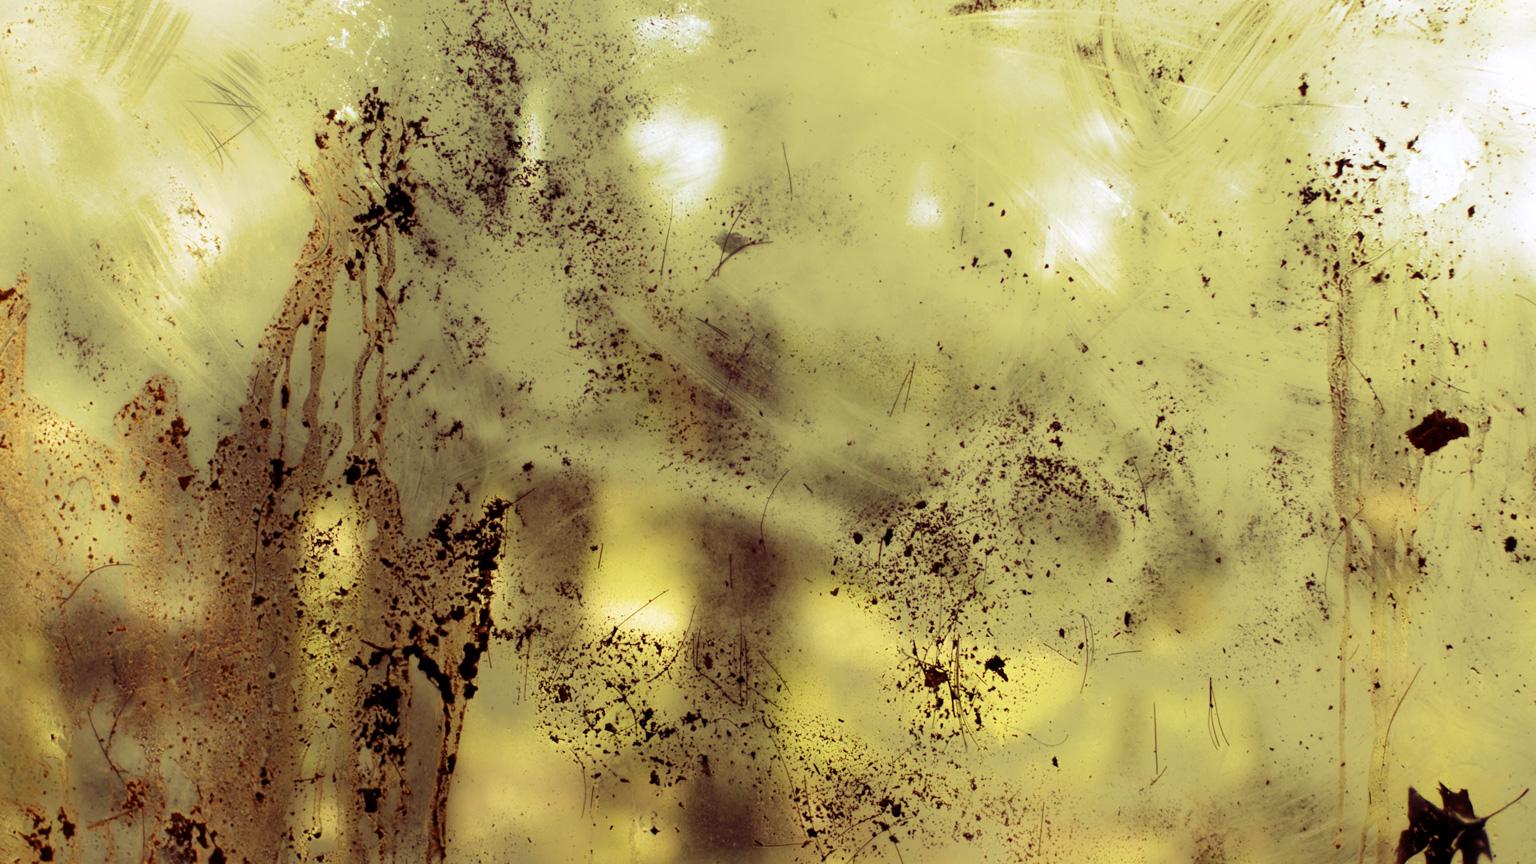 Conspiracy of Silence, Window 6 #001, 2009, C-Print